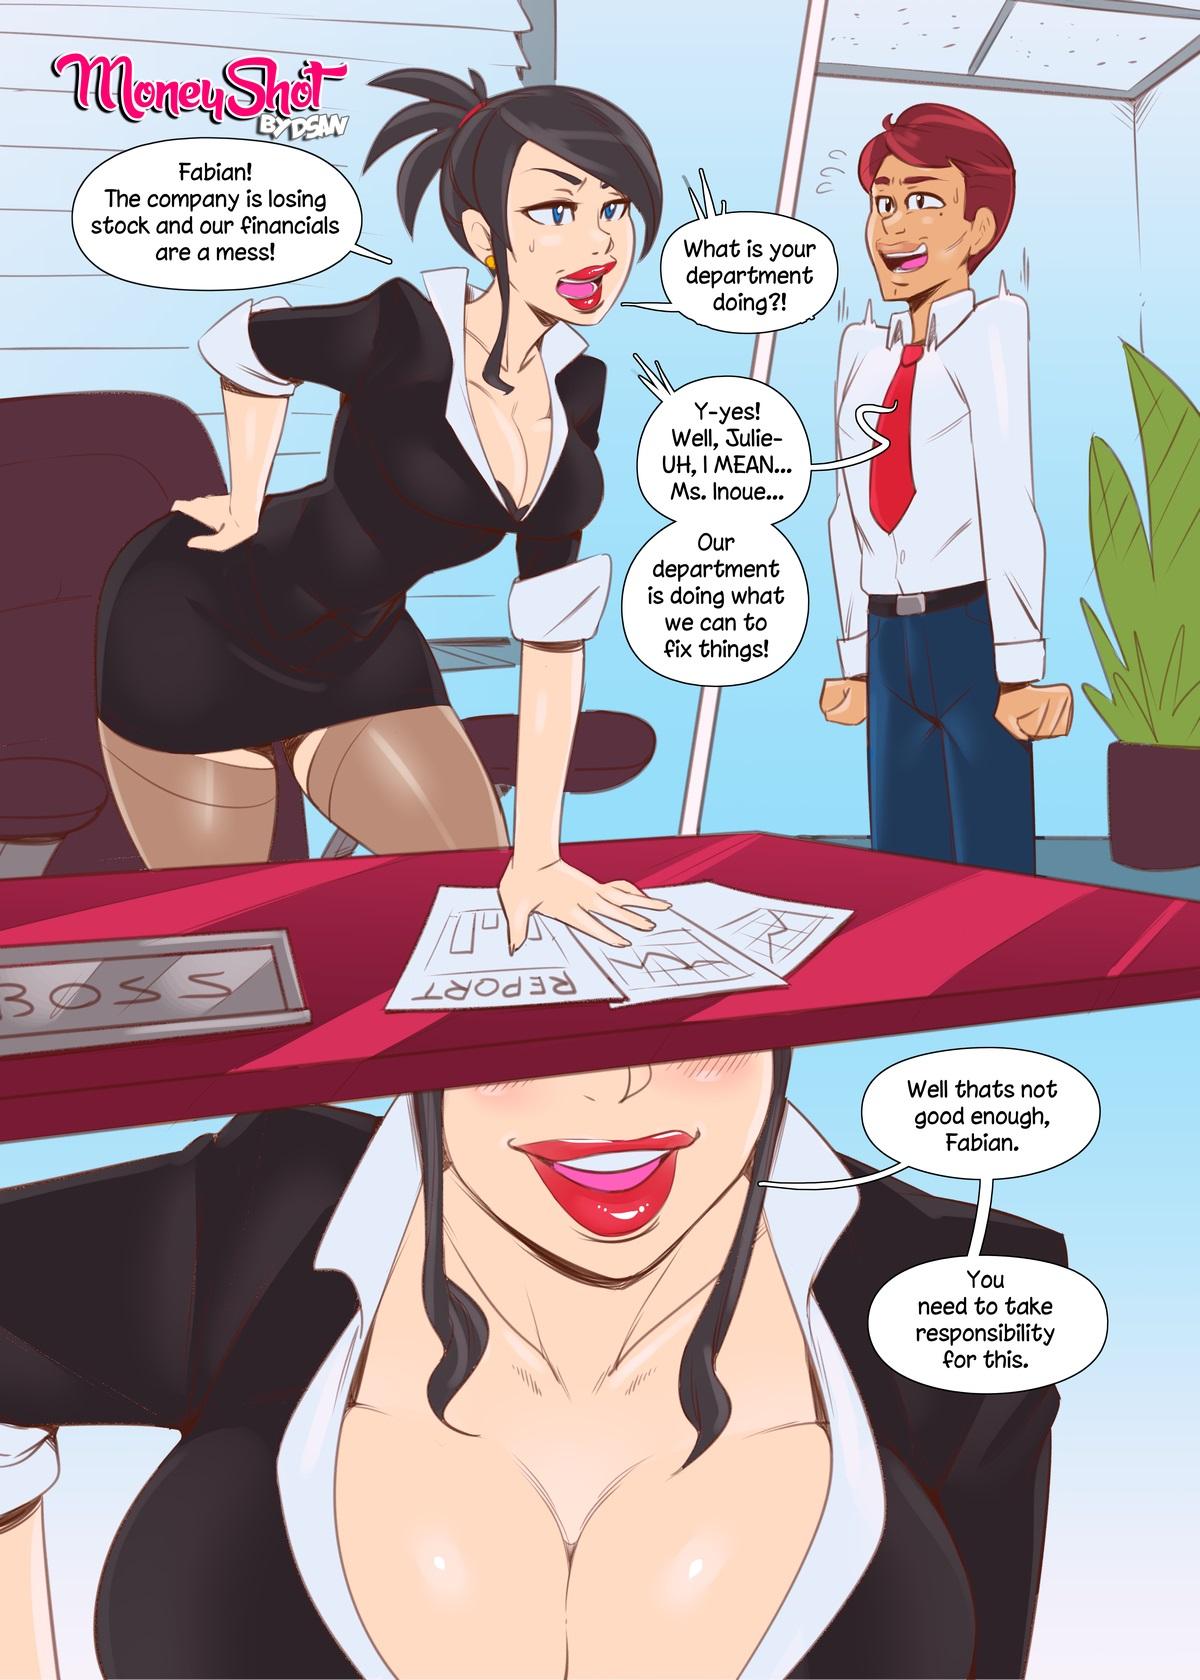 Moneyshot by Dsan porn comics 8 muses